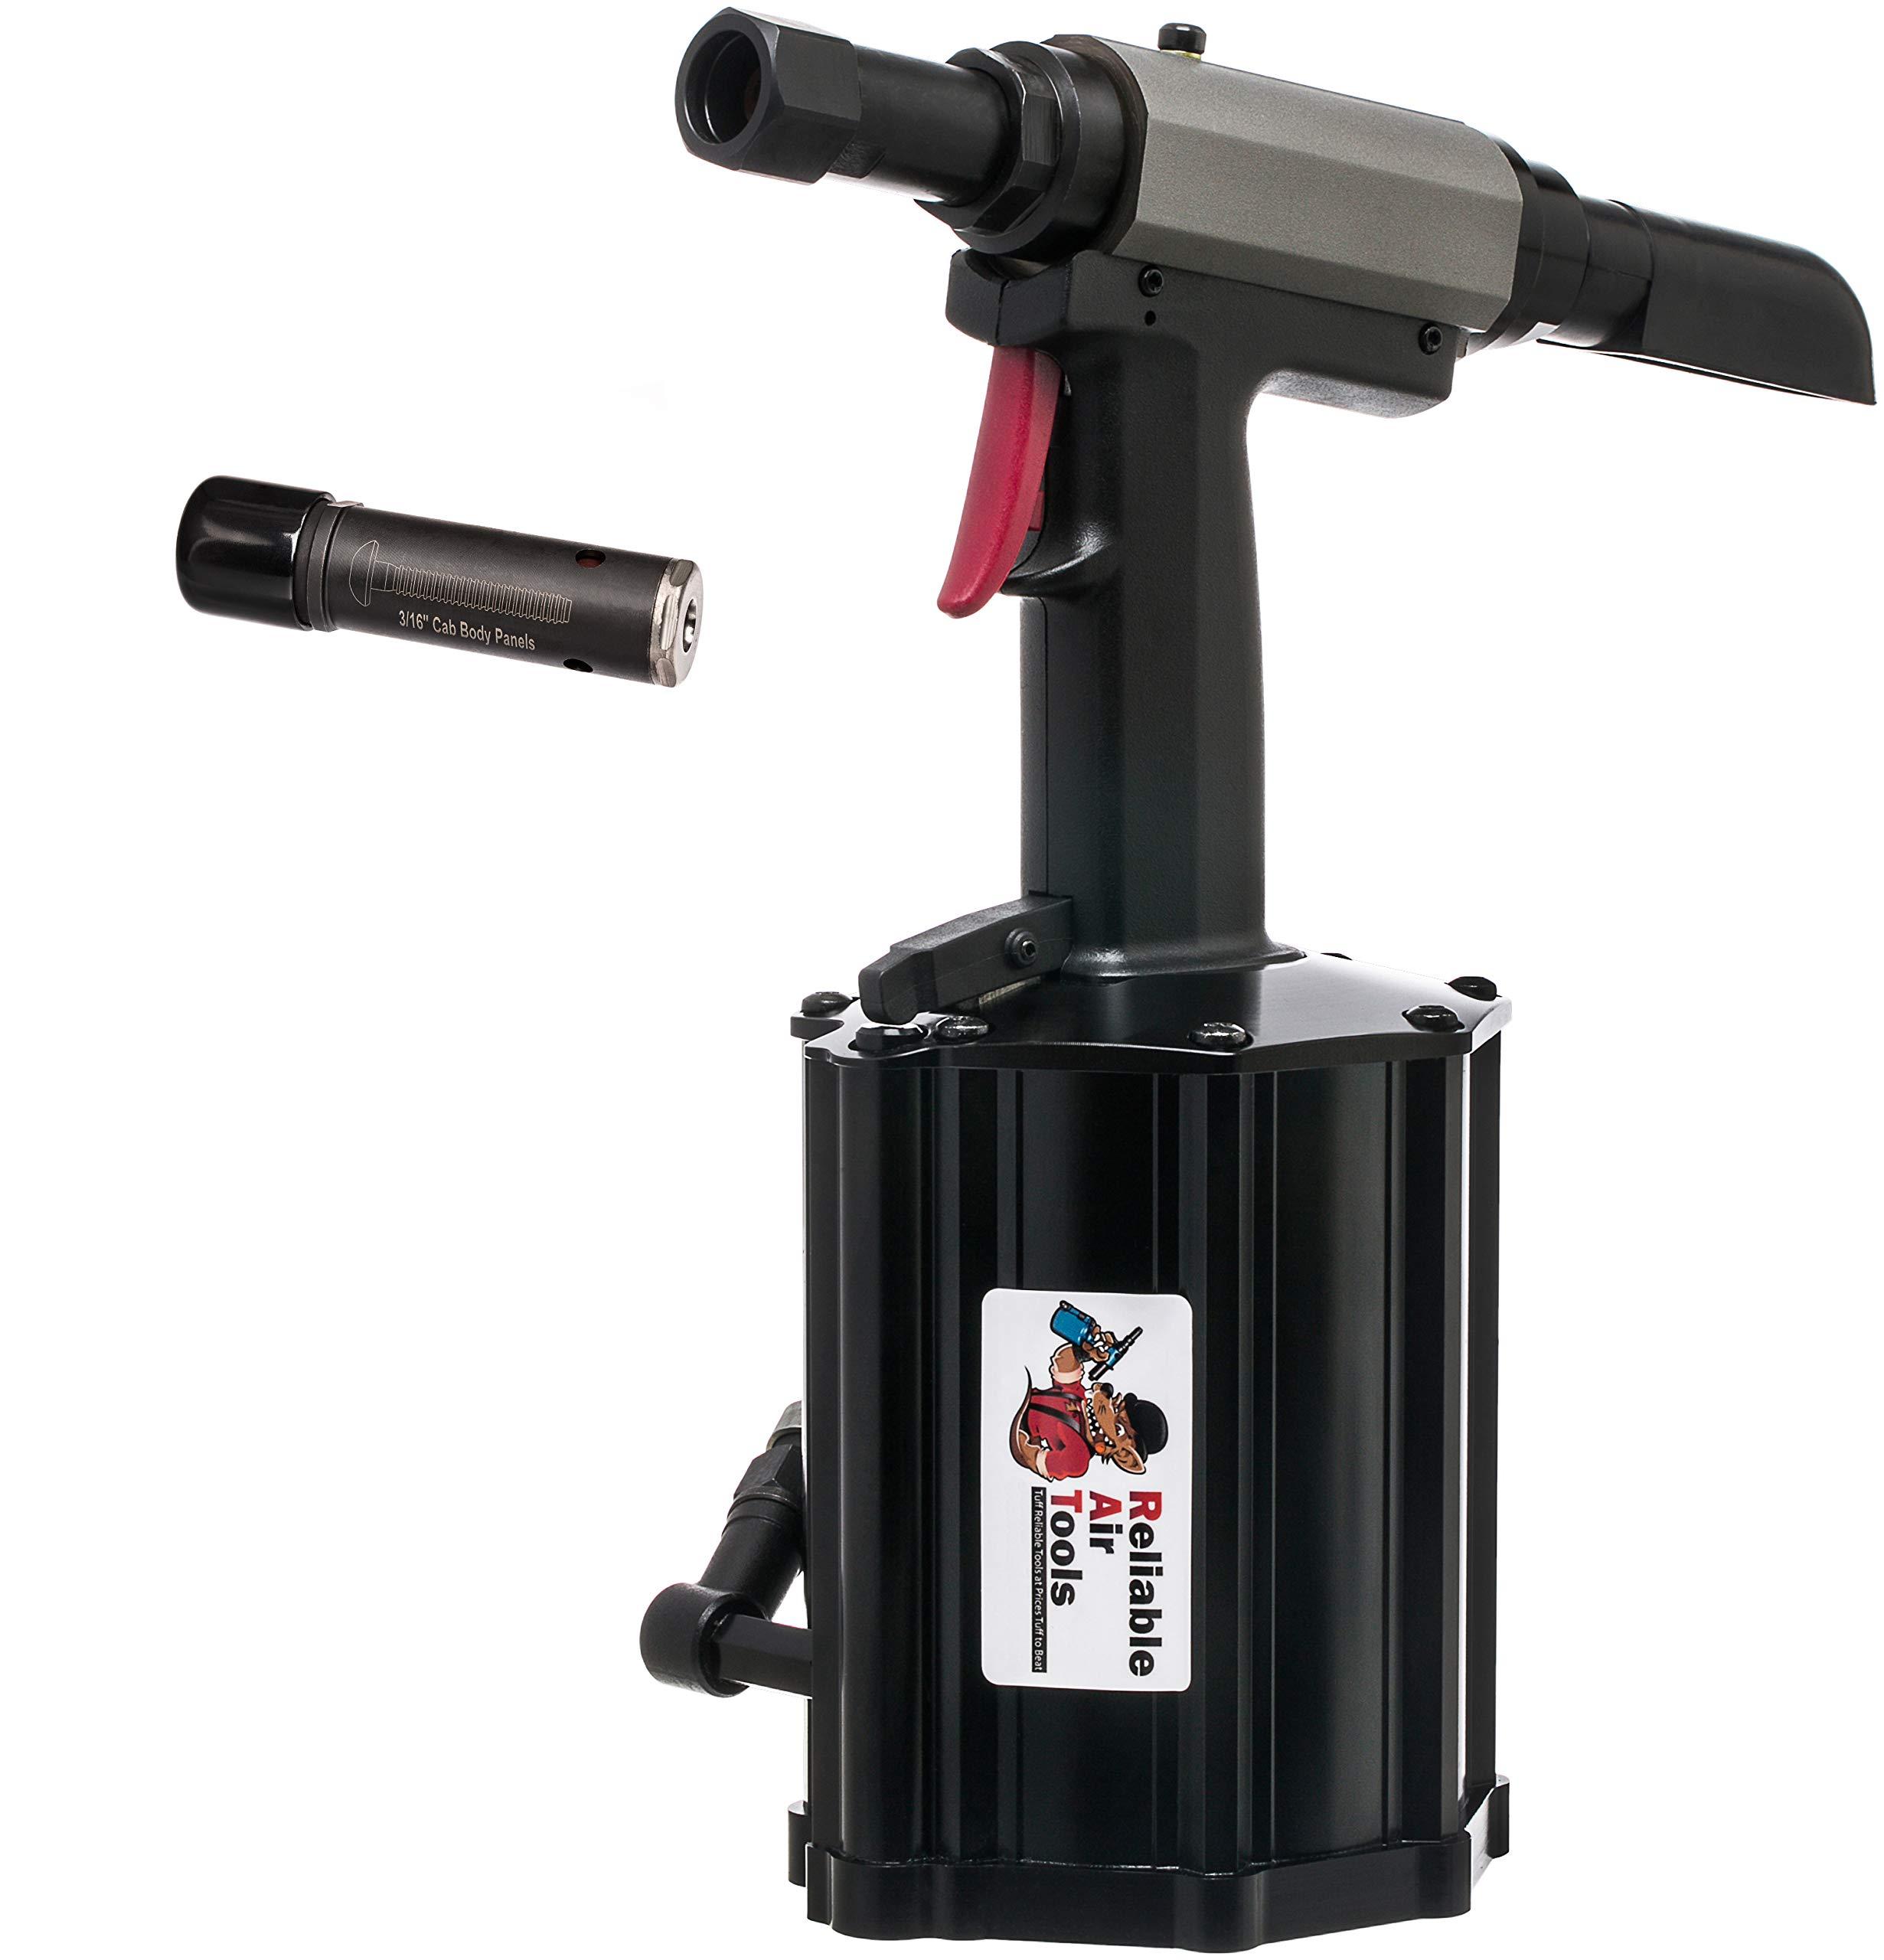 Reliable Air Tools RAT640 Basic Truck Cab Kit